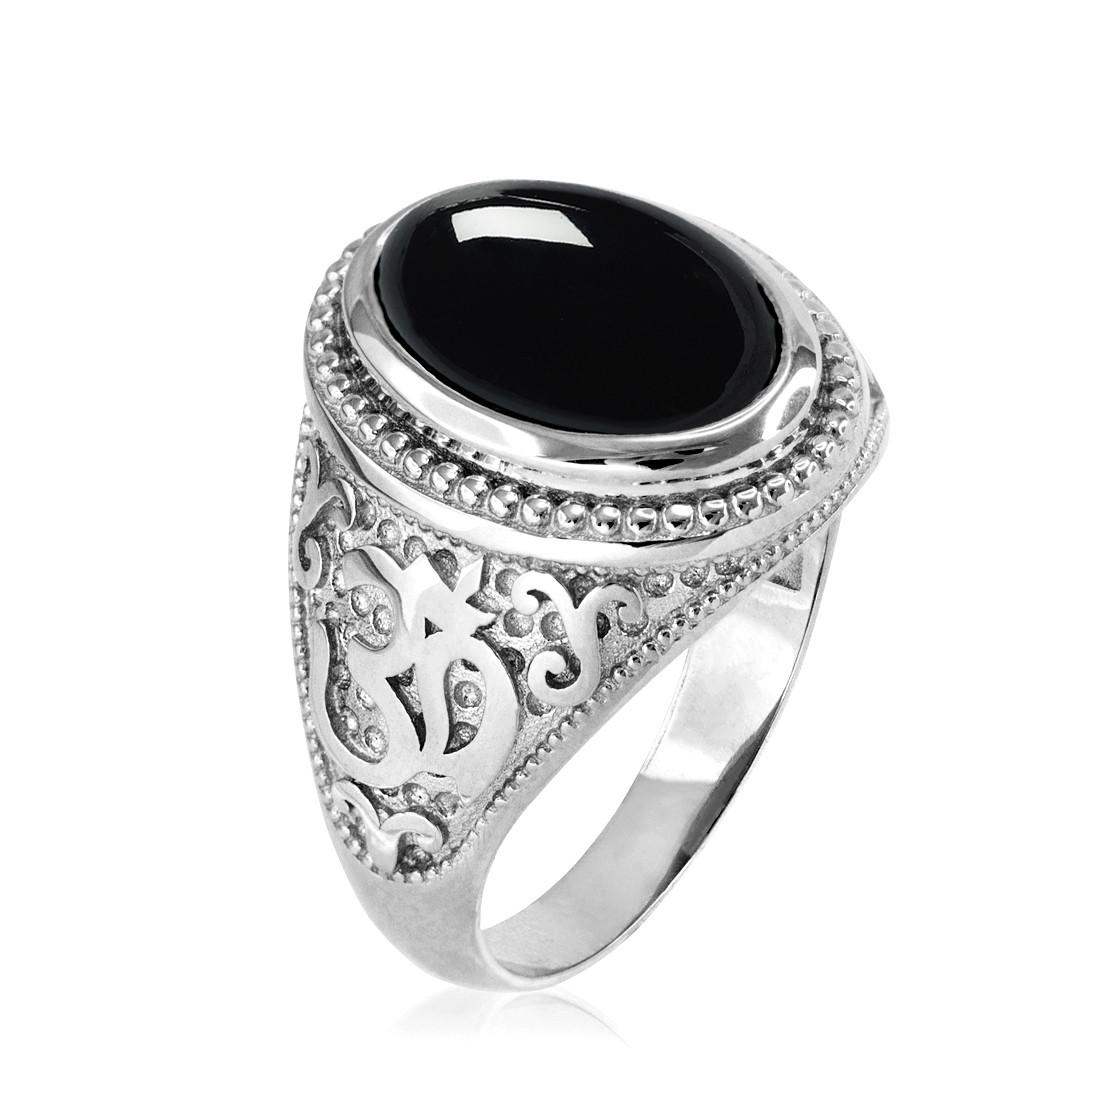 d09608e43f7b1 ... Sterling Silver Om Oval Cabochon Black Onyx Mens Yoga Ring. Silver Onyx  Men s Om ...